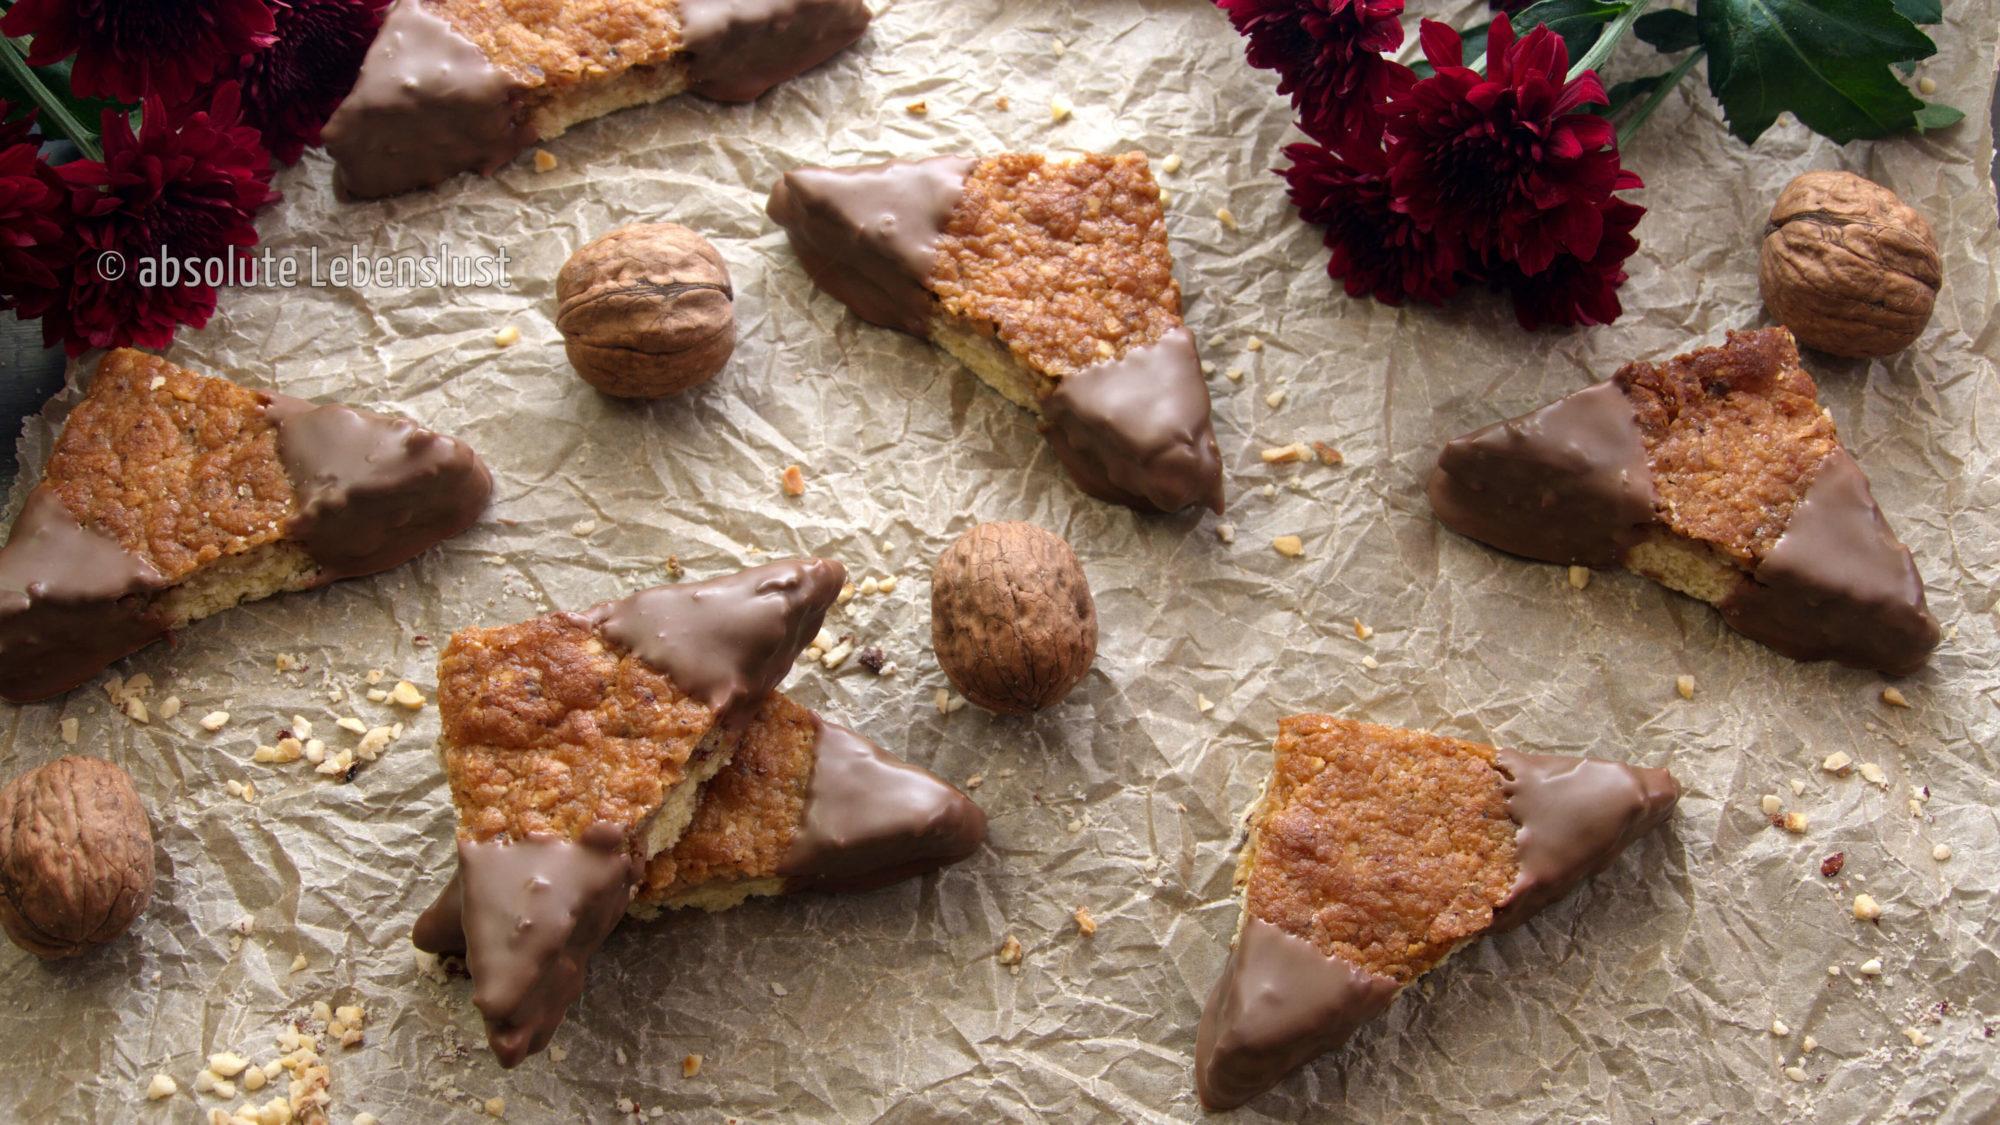 nussecken rezept, nussecken selber machen, nussecken selber backen, nussecken, rezepte für weihnachten, plätzchenrezepte